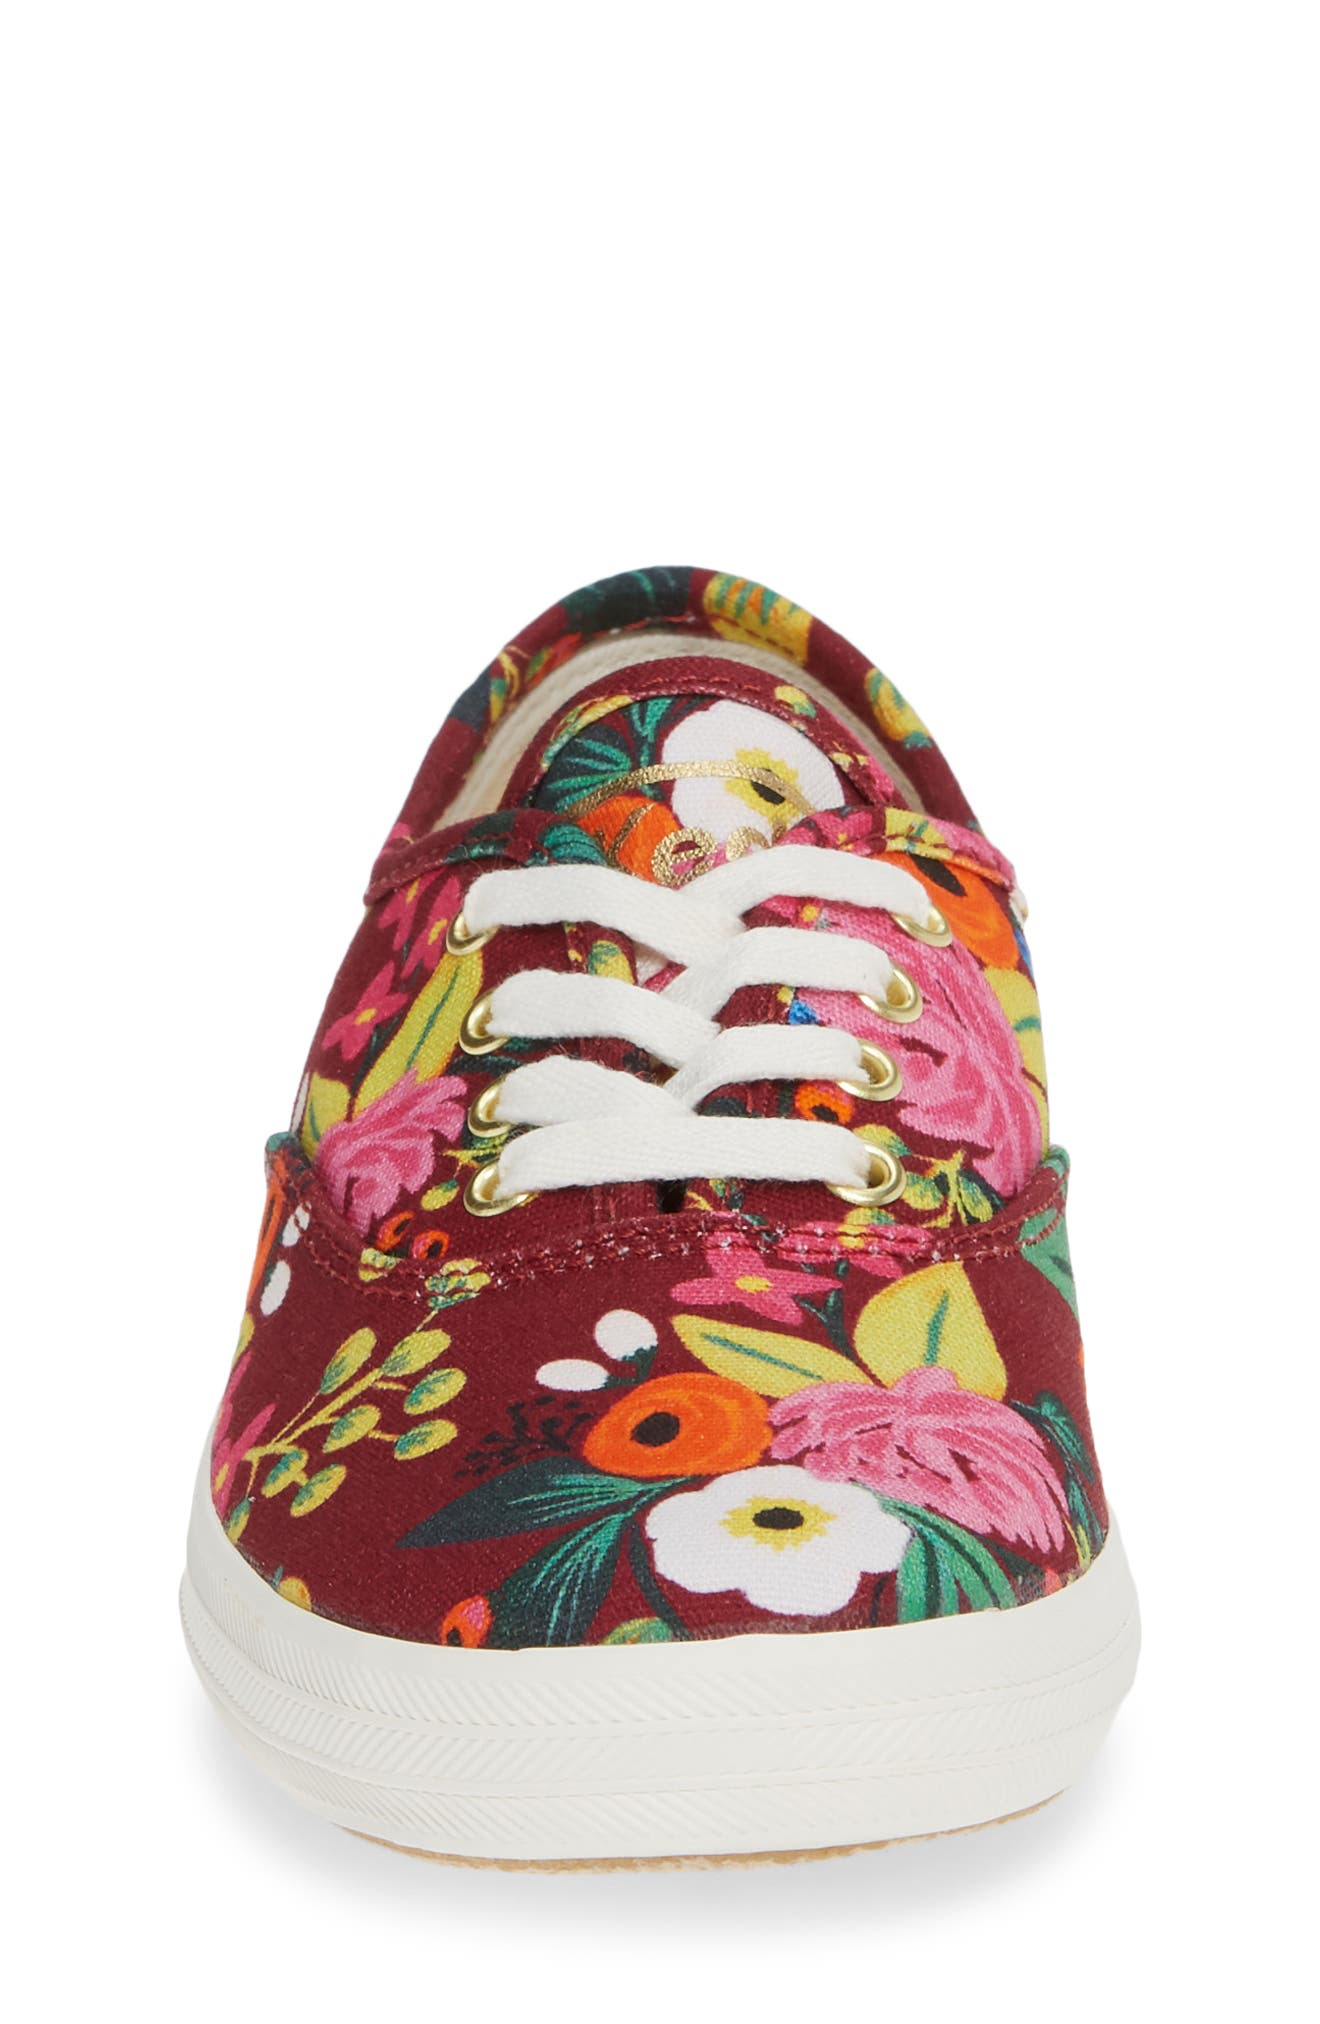 x Rifle Paper Co. Floral Print Champion Sneaker,                             Alternate thumbnail 4, color,                             VINTAGE BLOSSOM